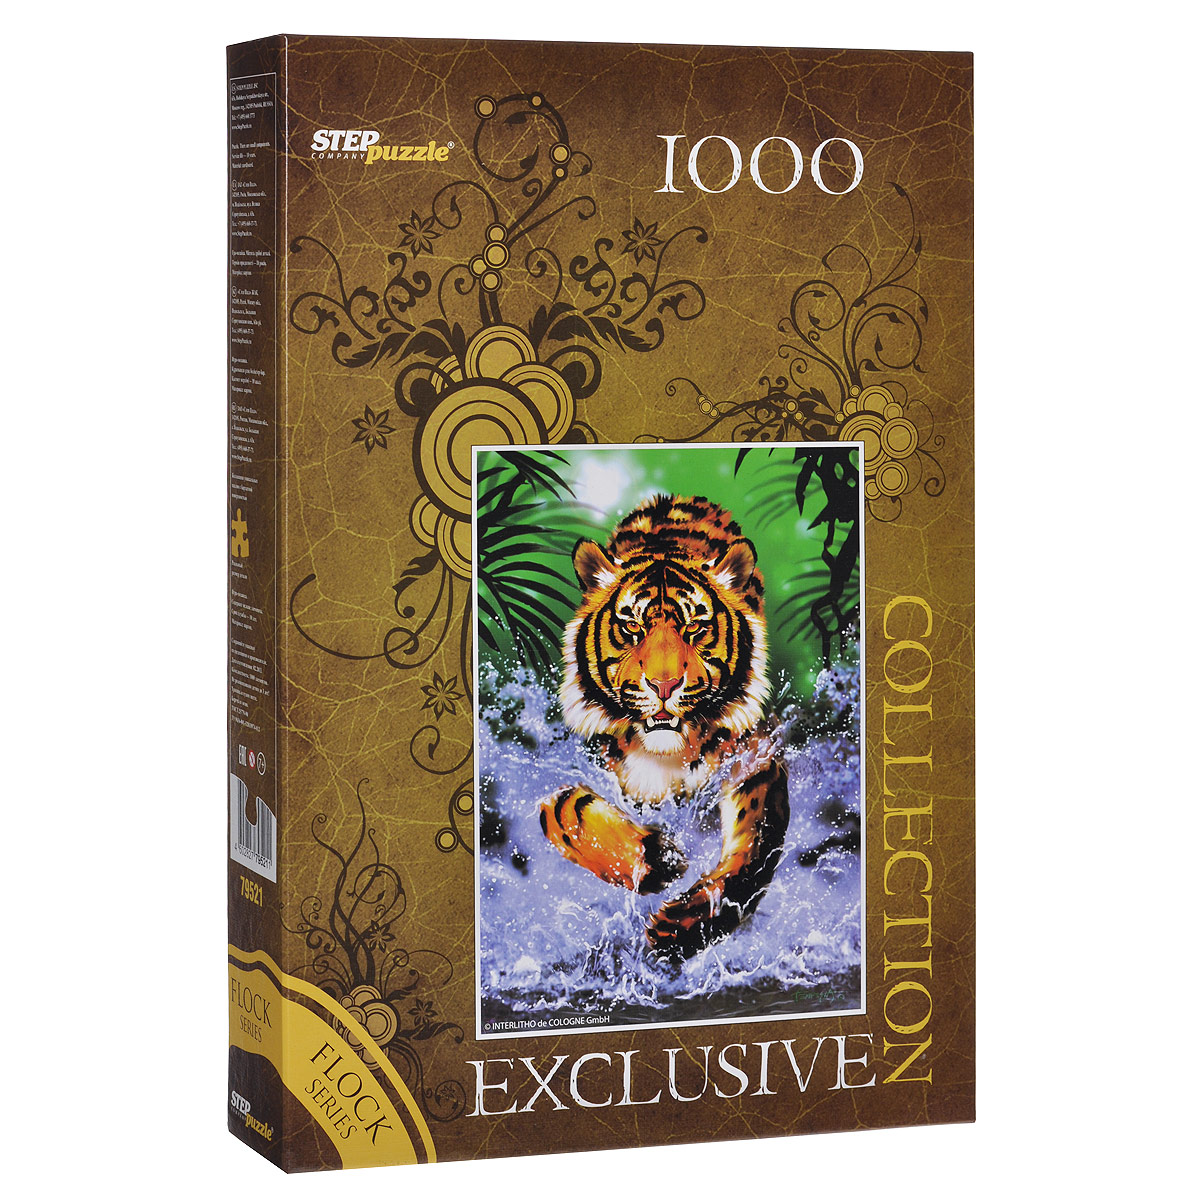 Тигр. Пазл, 1000 элементов. 79521